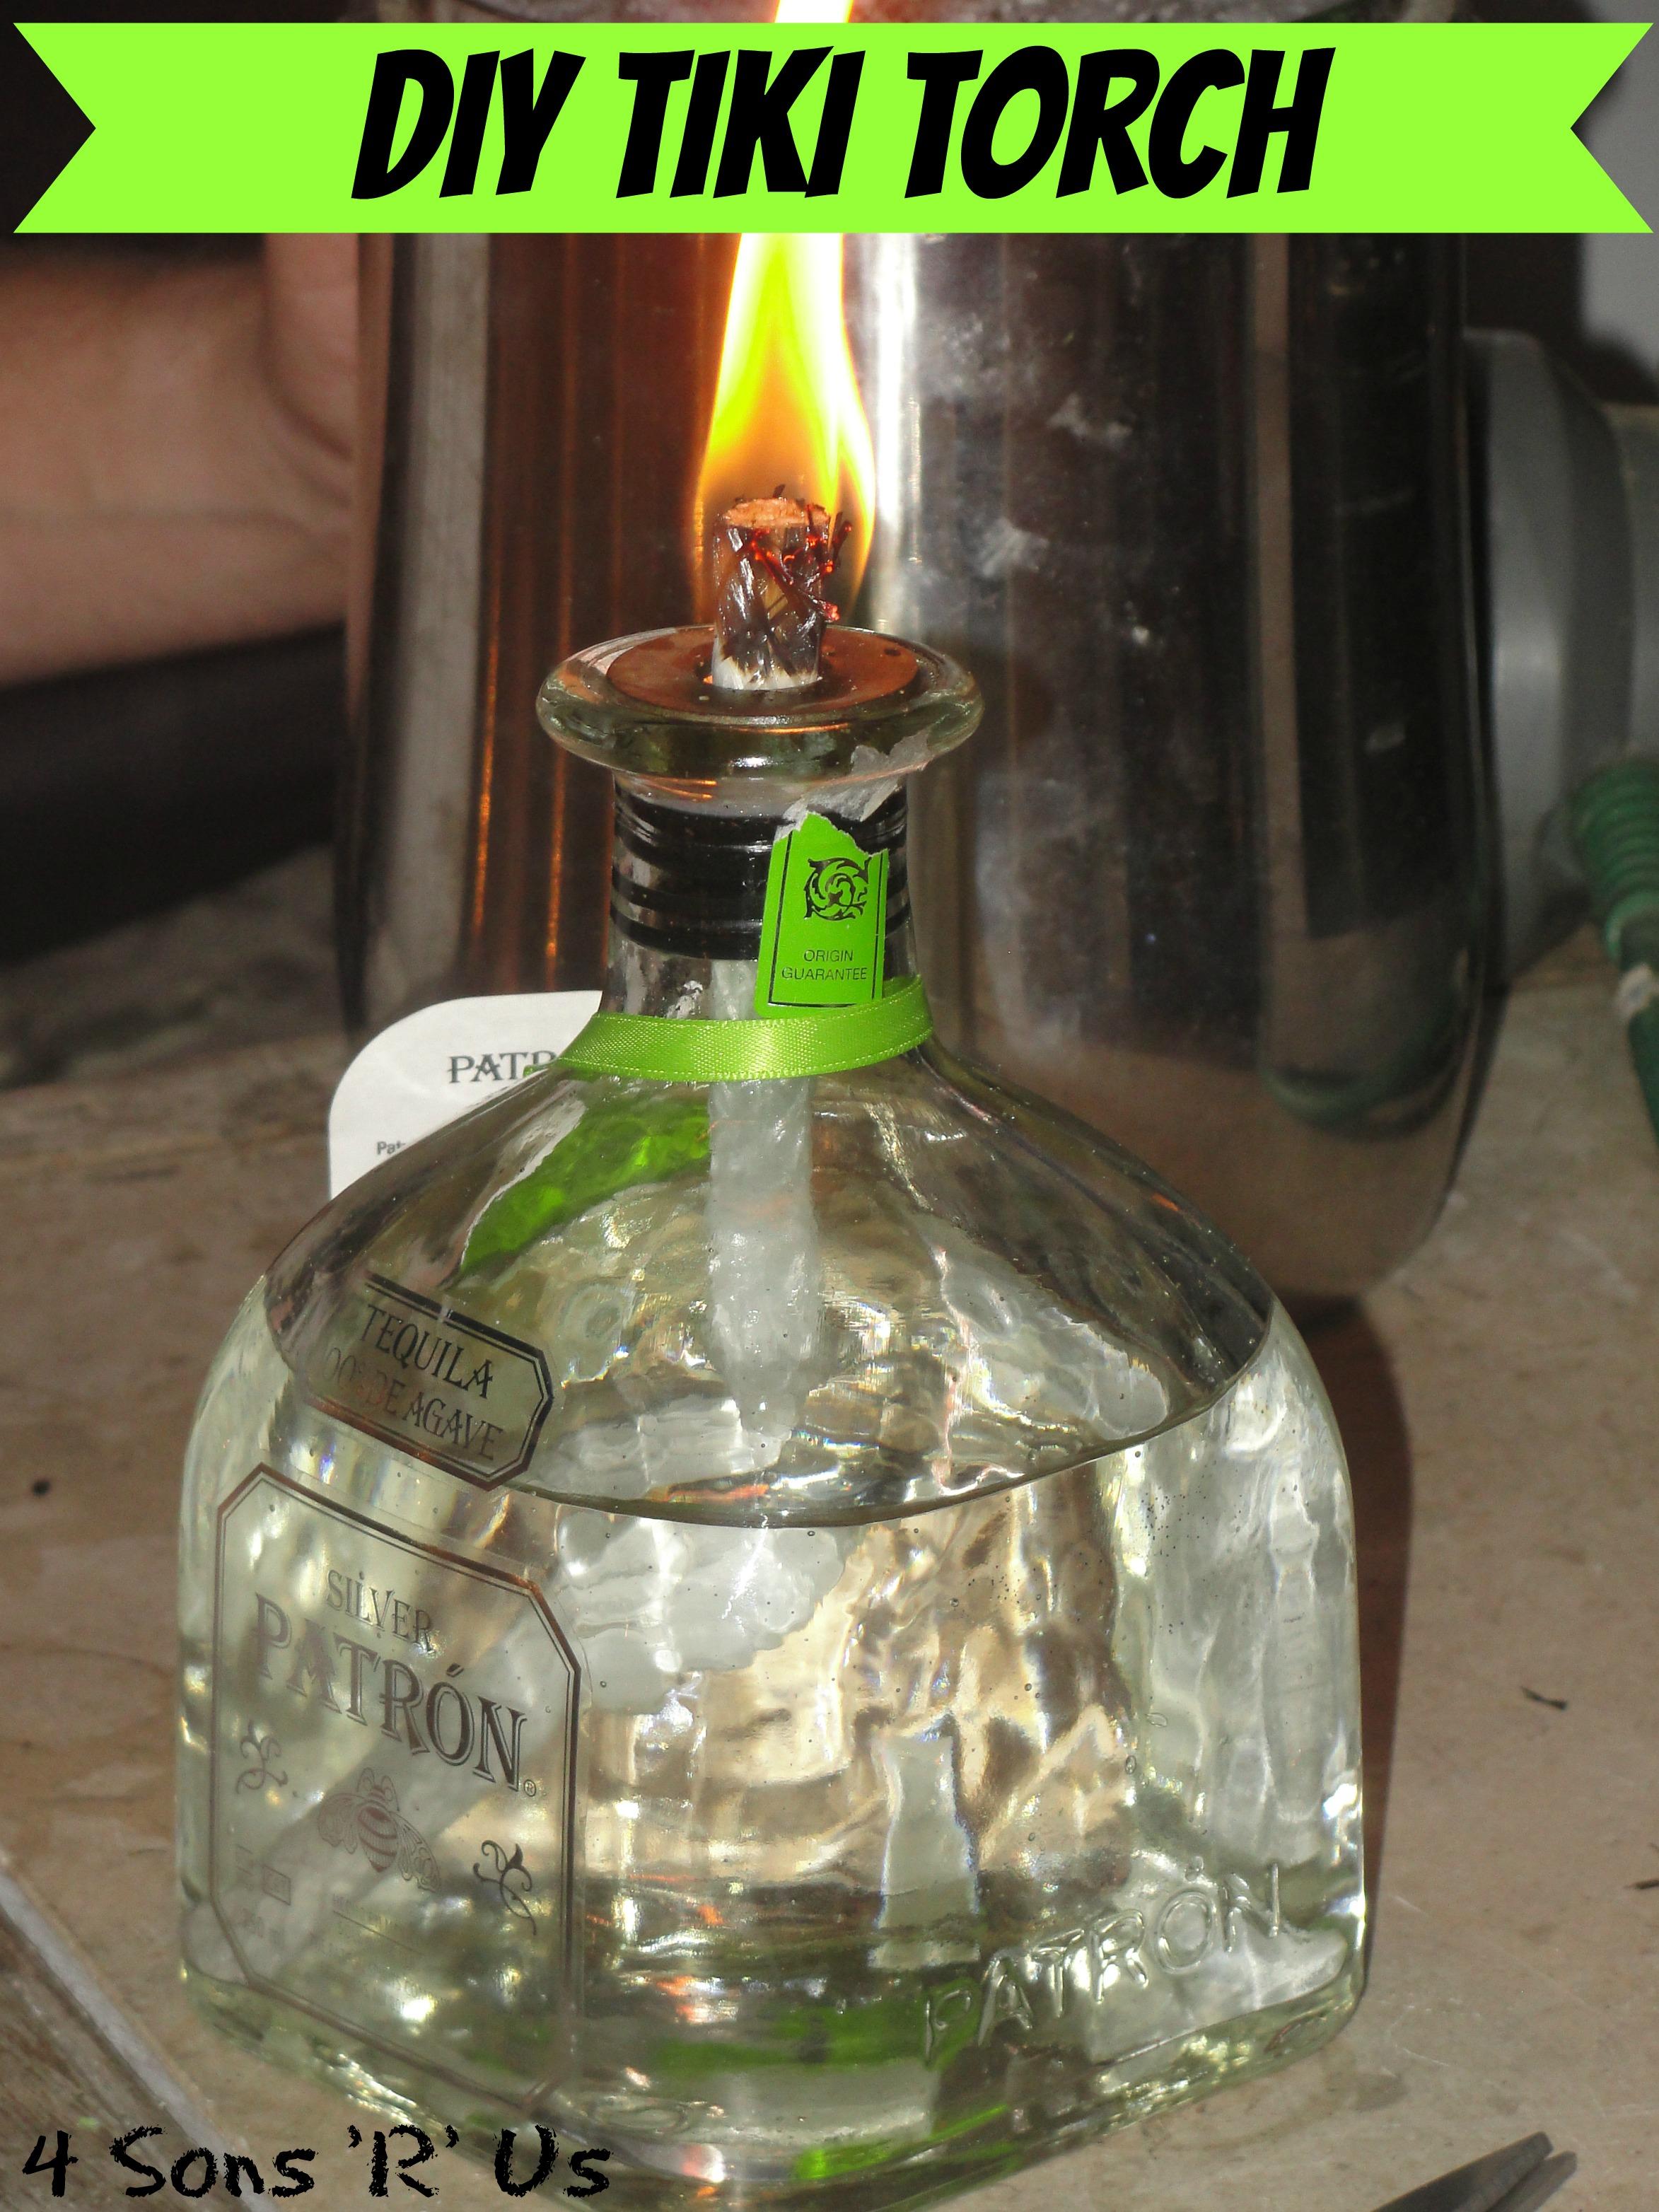 Diy Tiki Torch 4 Sons R Us